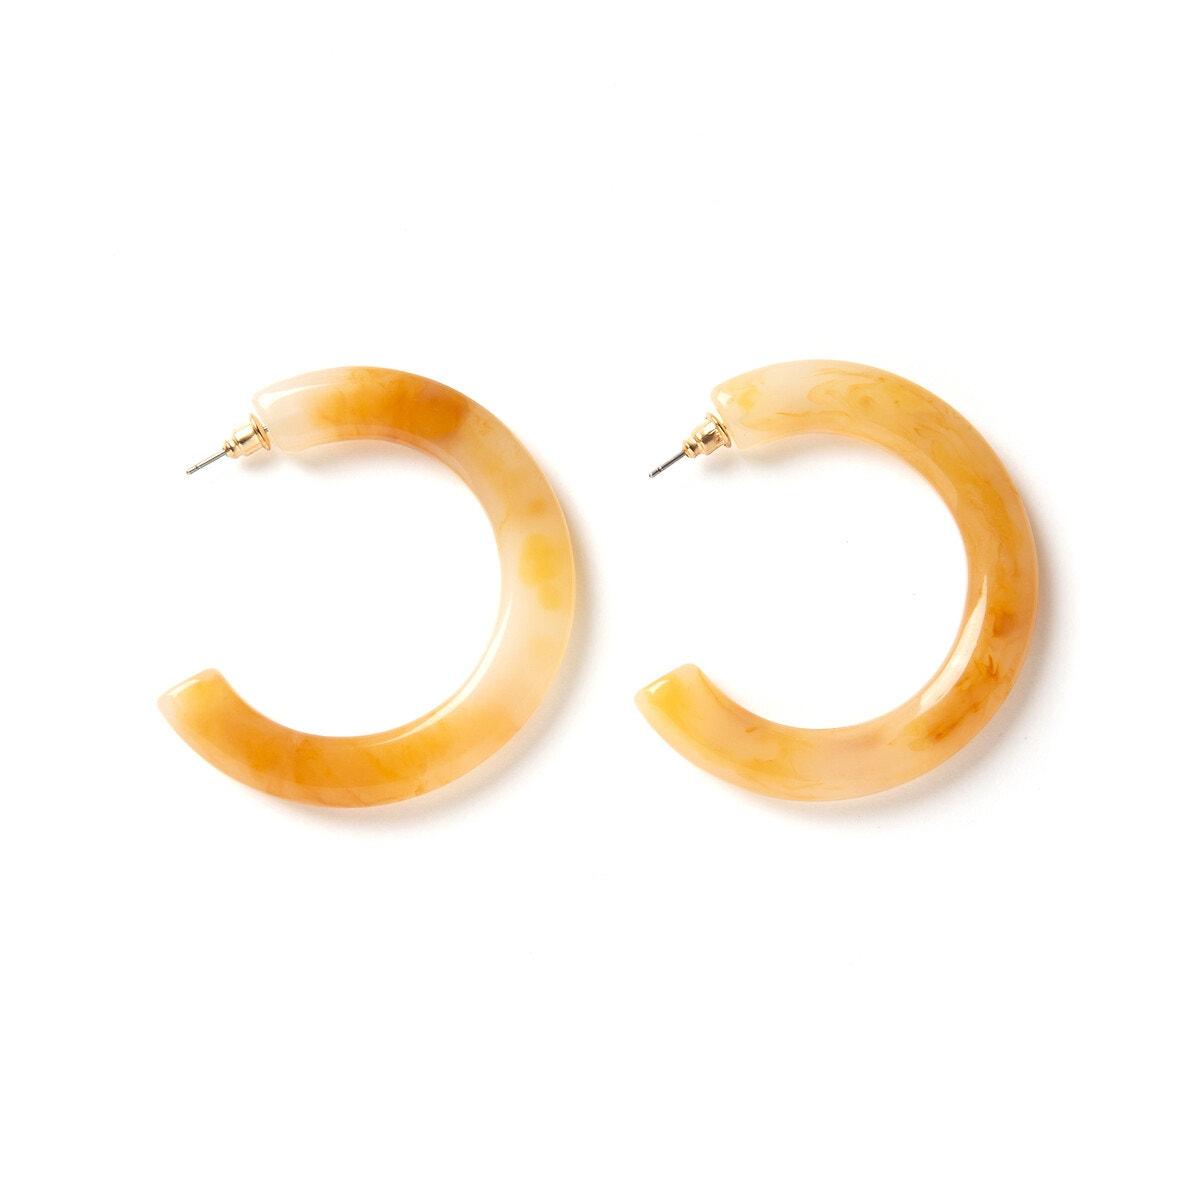 La Redoute Collections - Κρεμαστά σκουλαρίκια σε σχήμα ανοιχτού κρίκου 350174023 - 5485